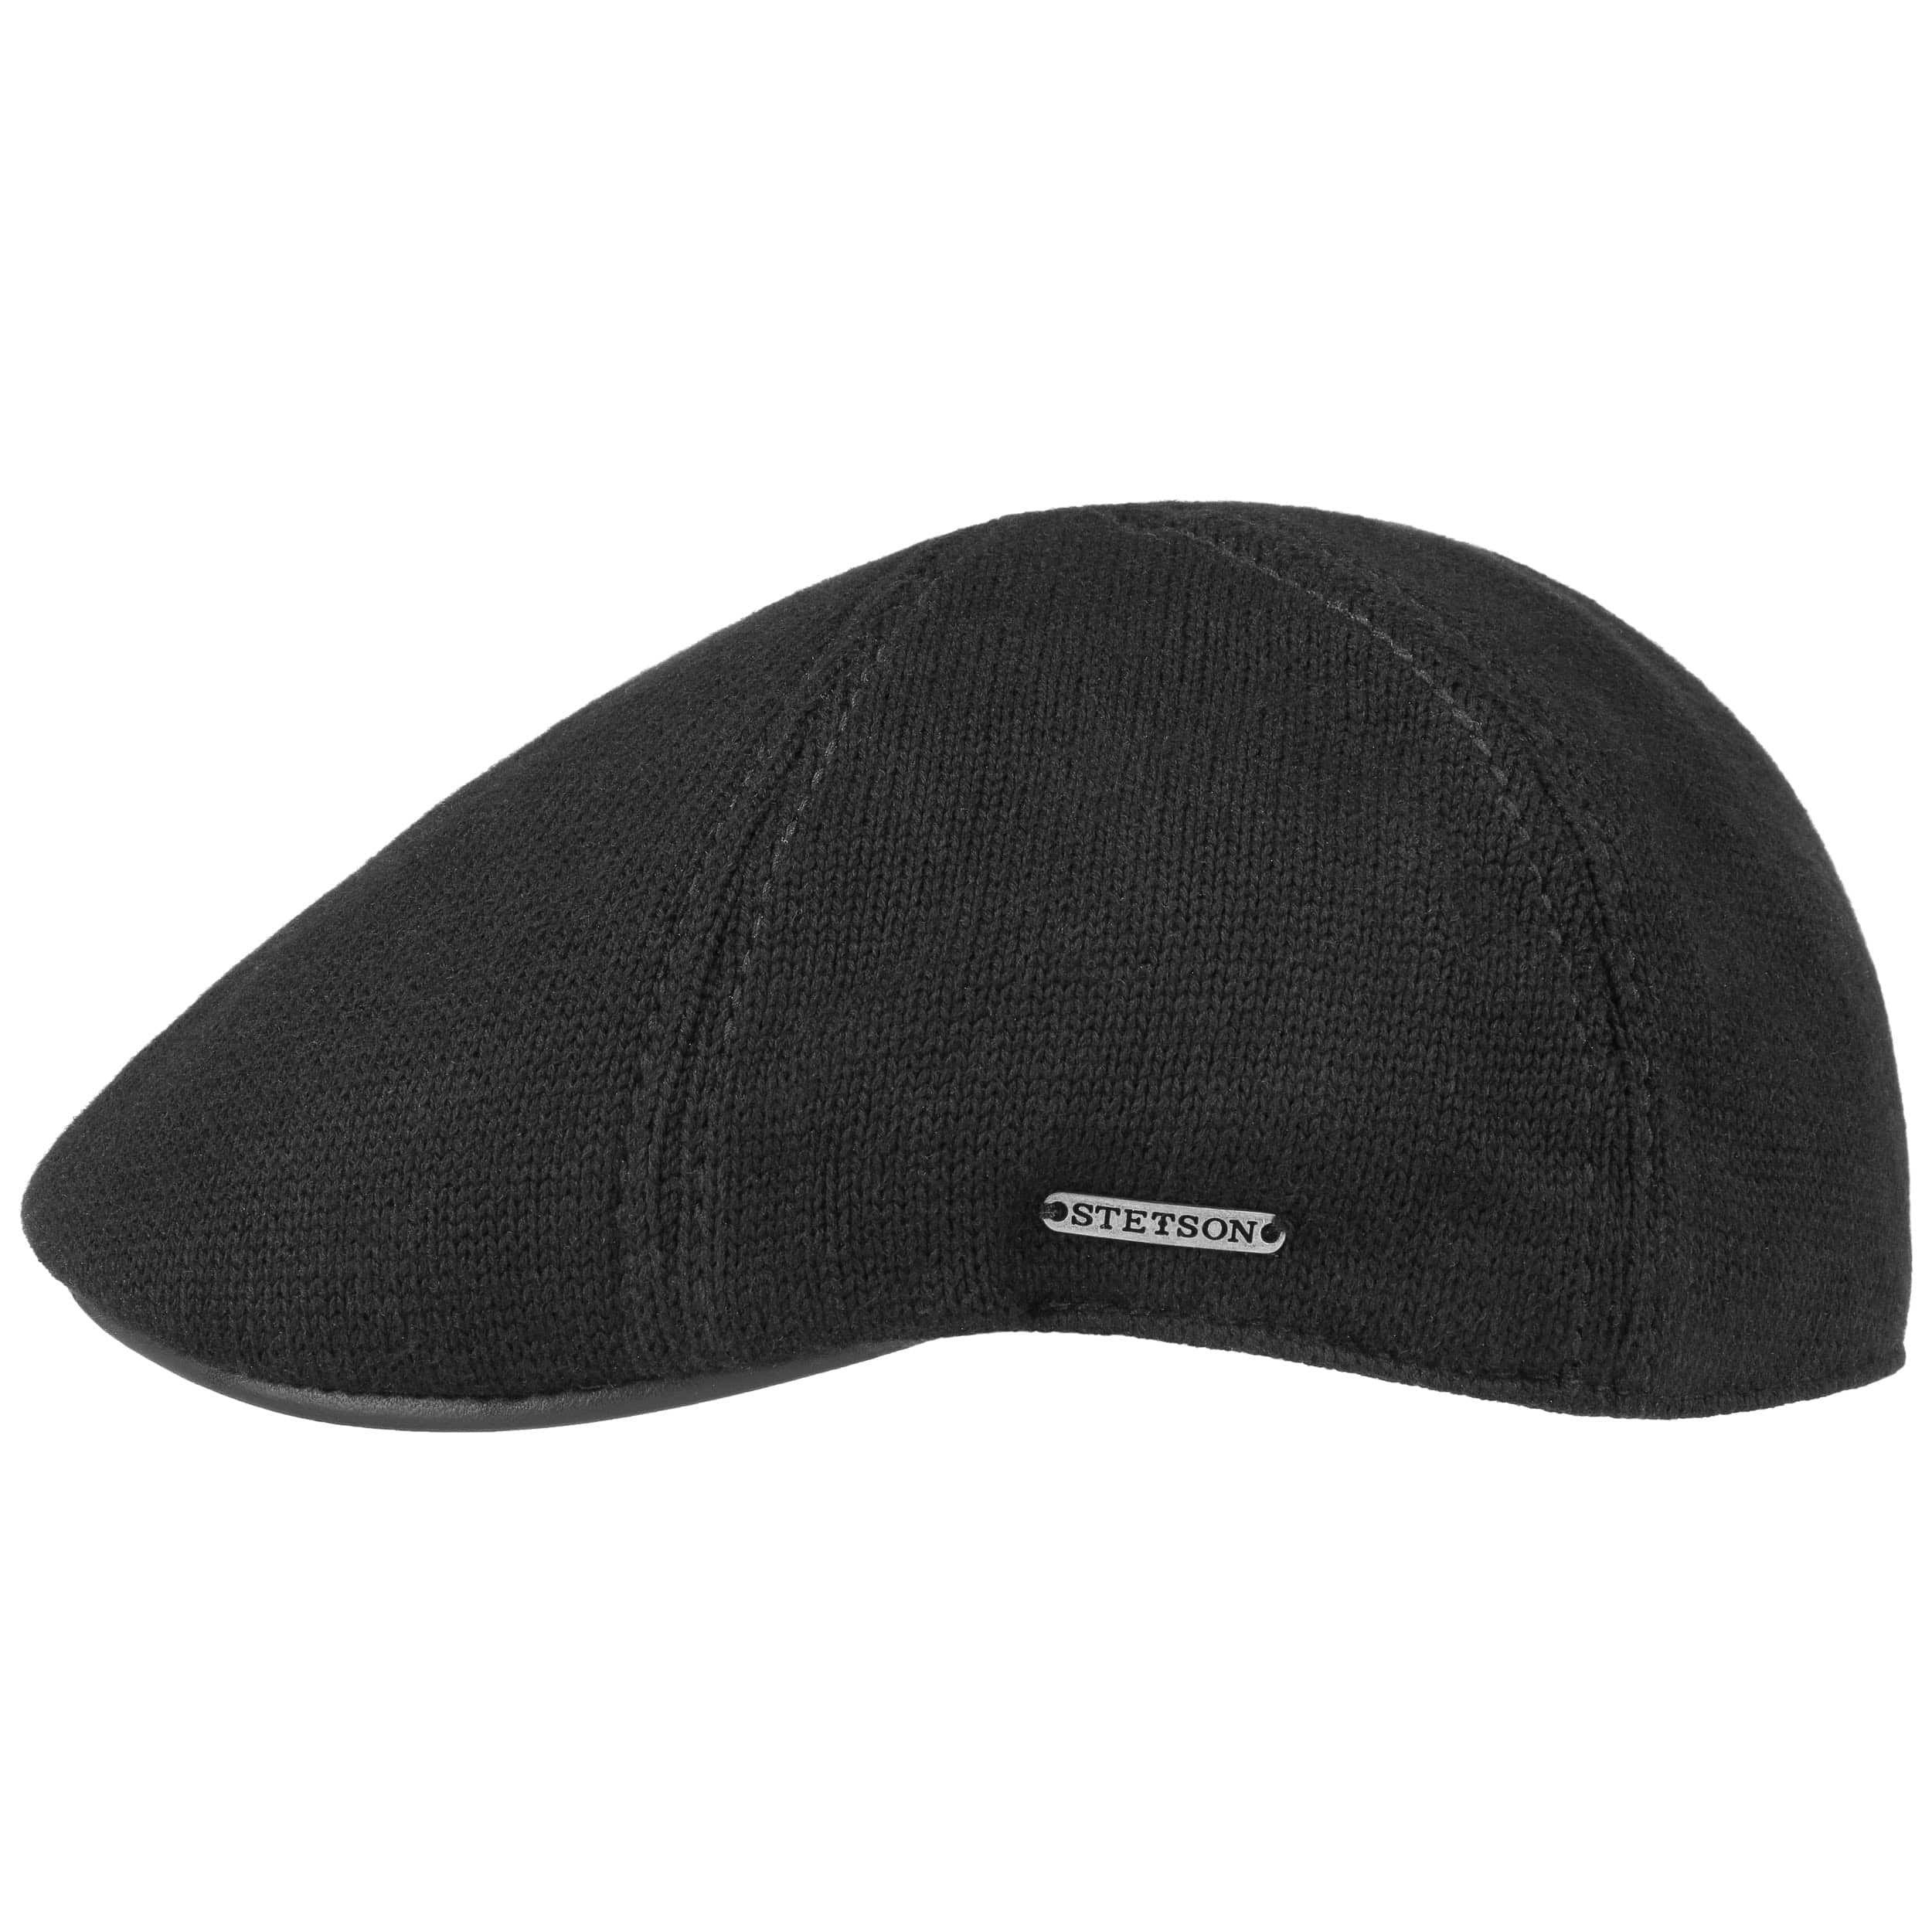 Muskegon Gatsby Cap black